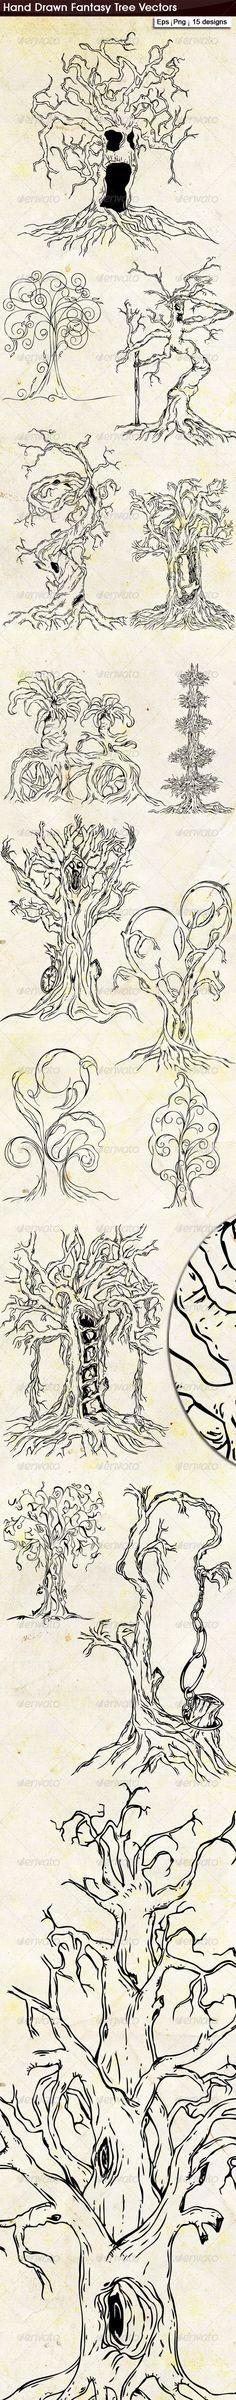 Hand Drawn Fantasy Tree Vector